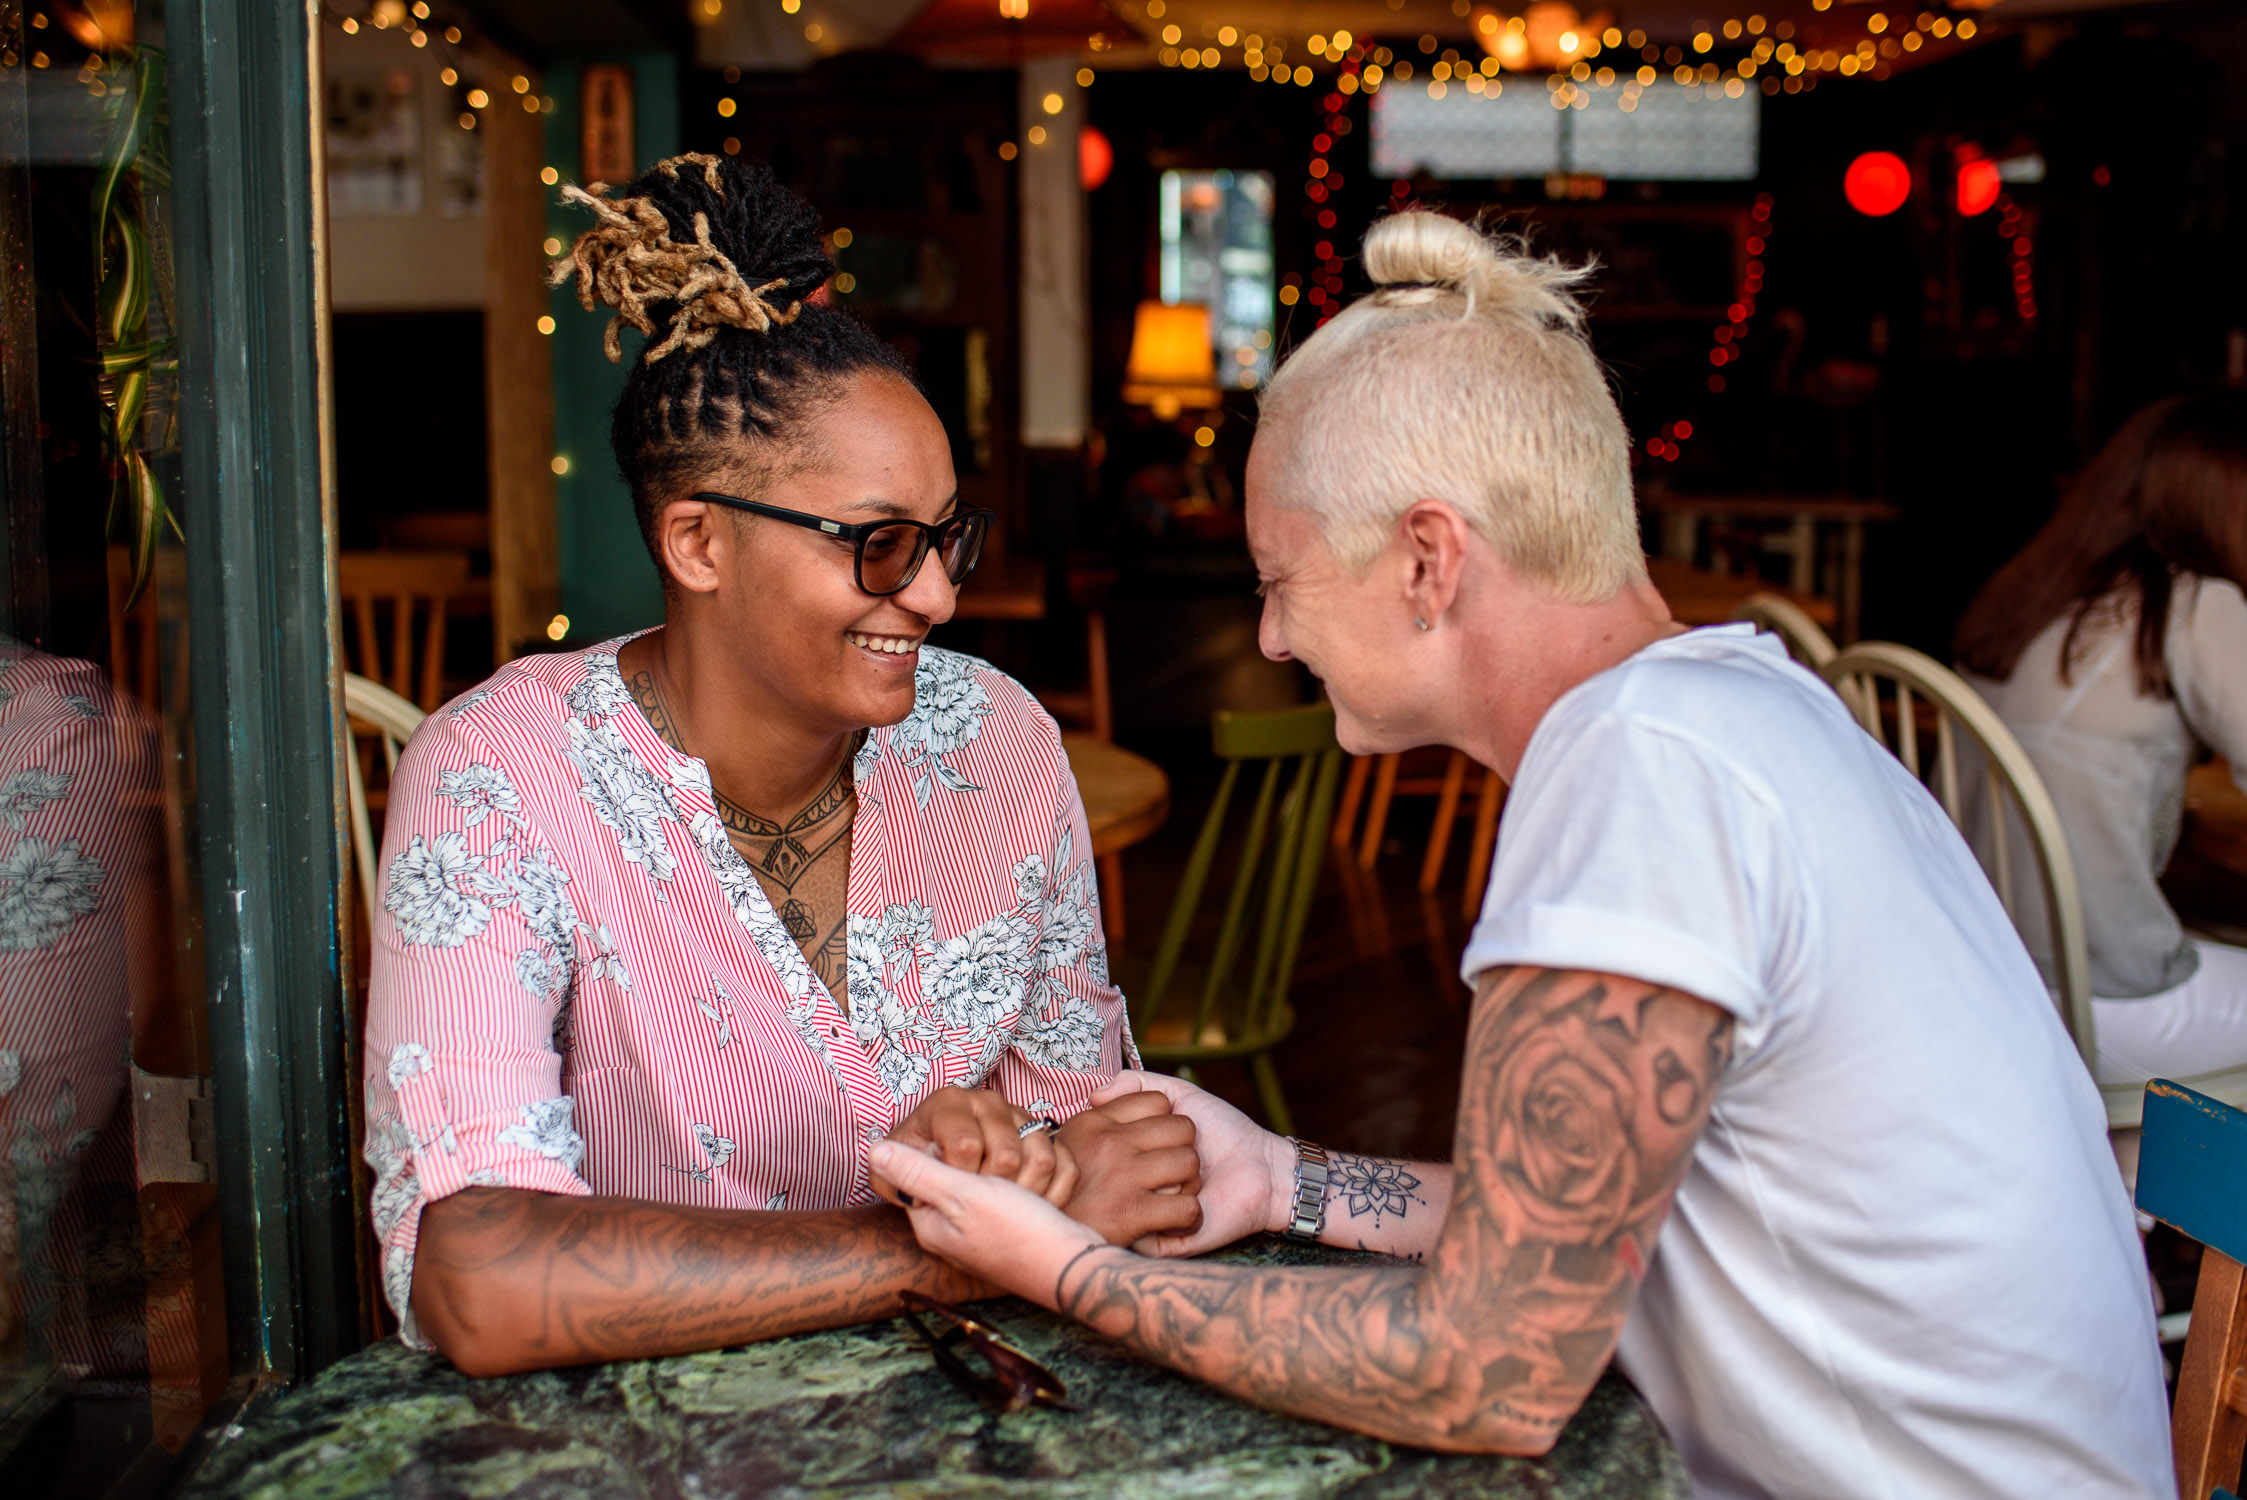 Unique Engagement Photoshoot- Corina Photography- Pride Wedding- Brighton Pride- Unconventional Wedding- Quirky Wedding- Alternative Wedding